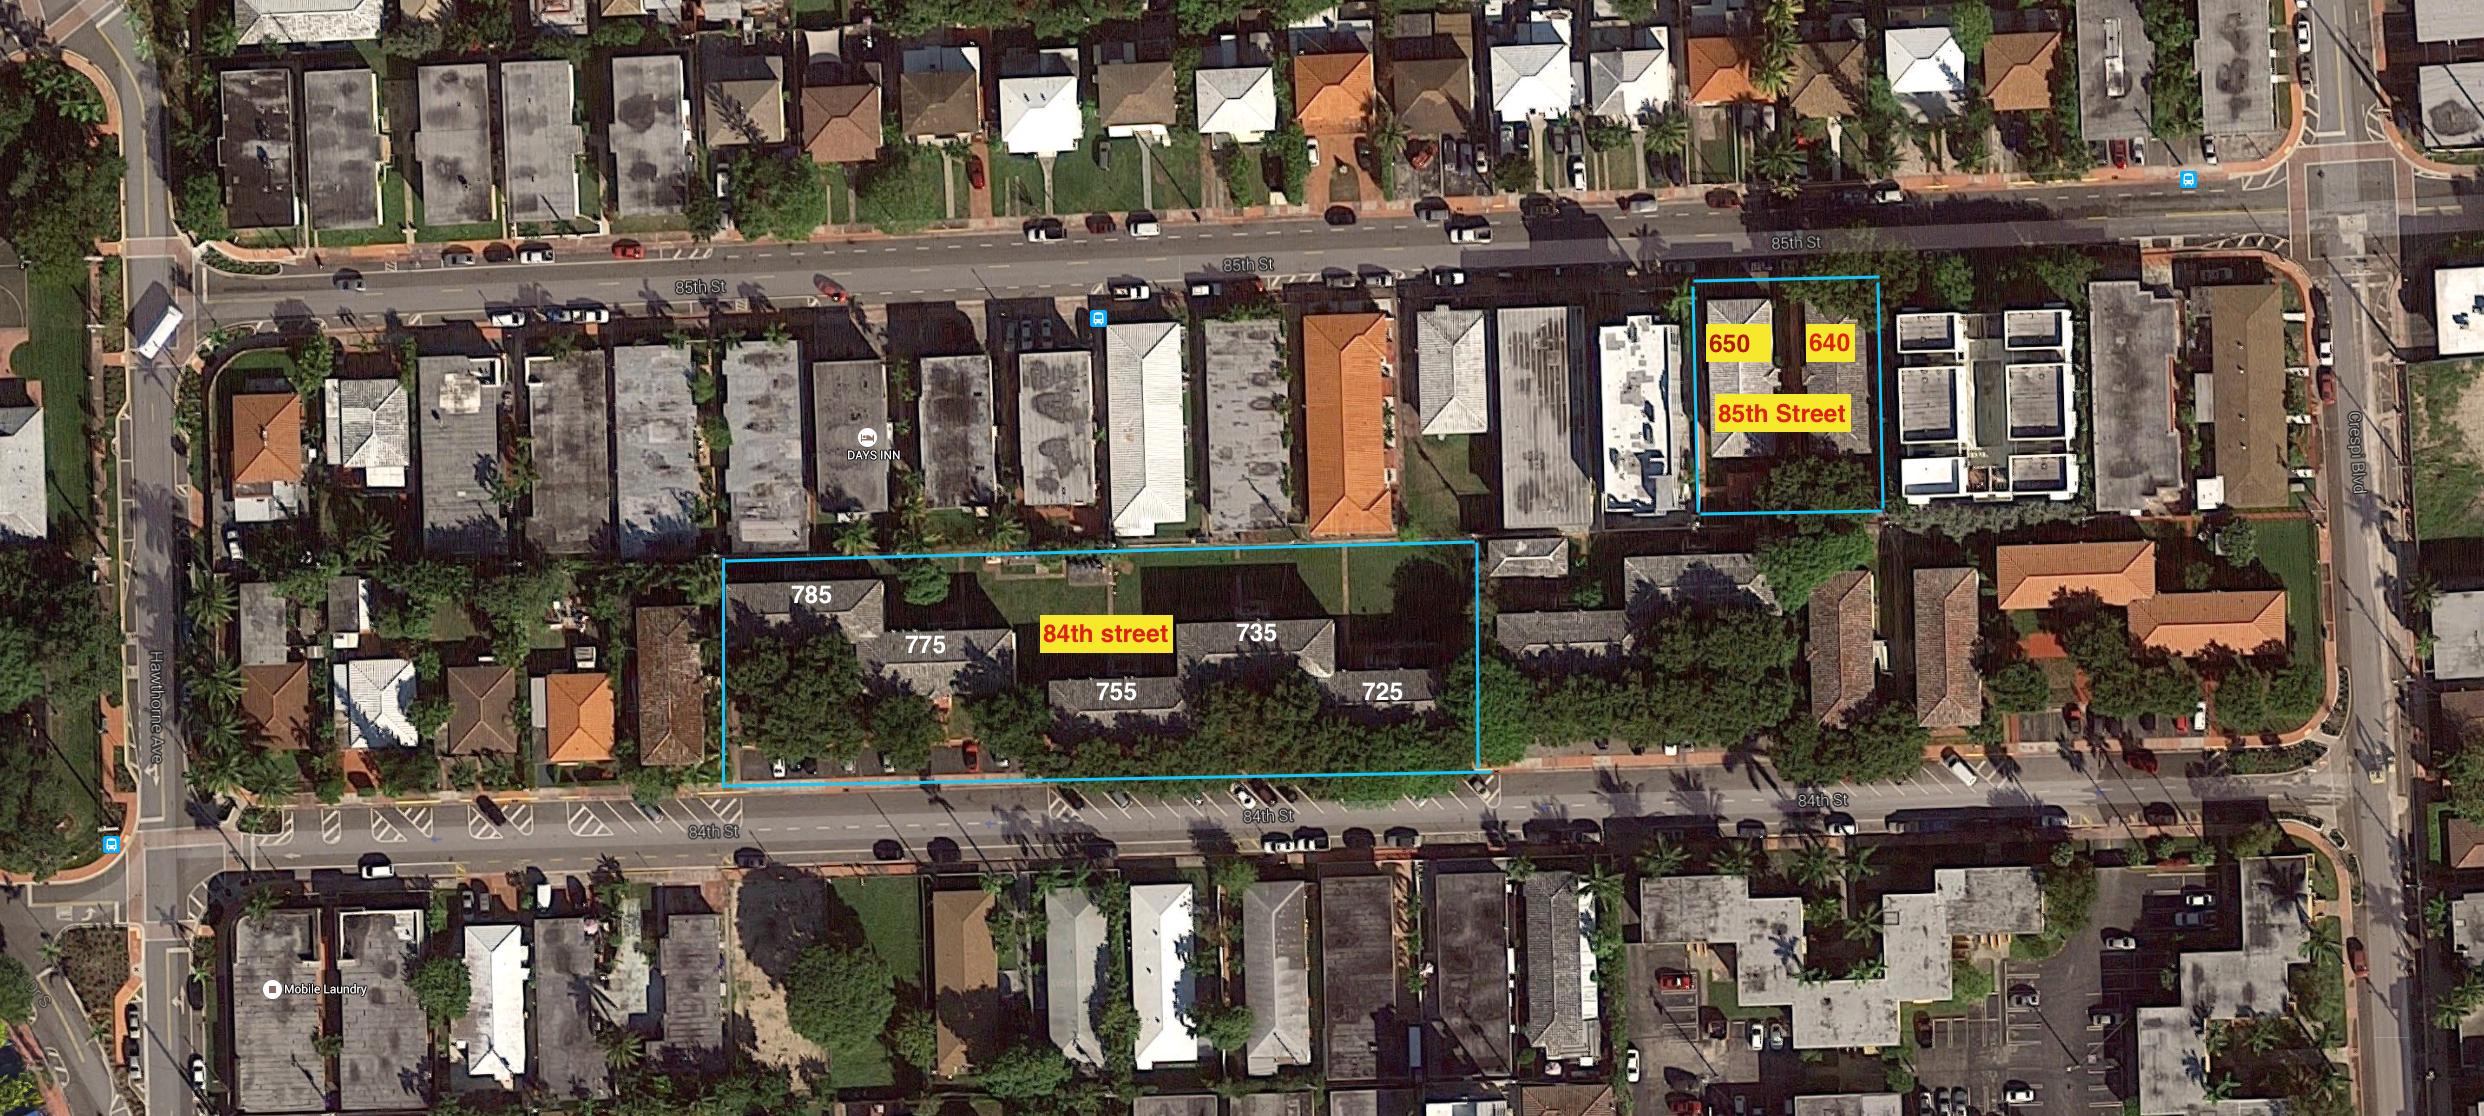 Map details of buildings